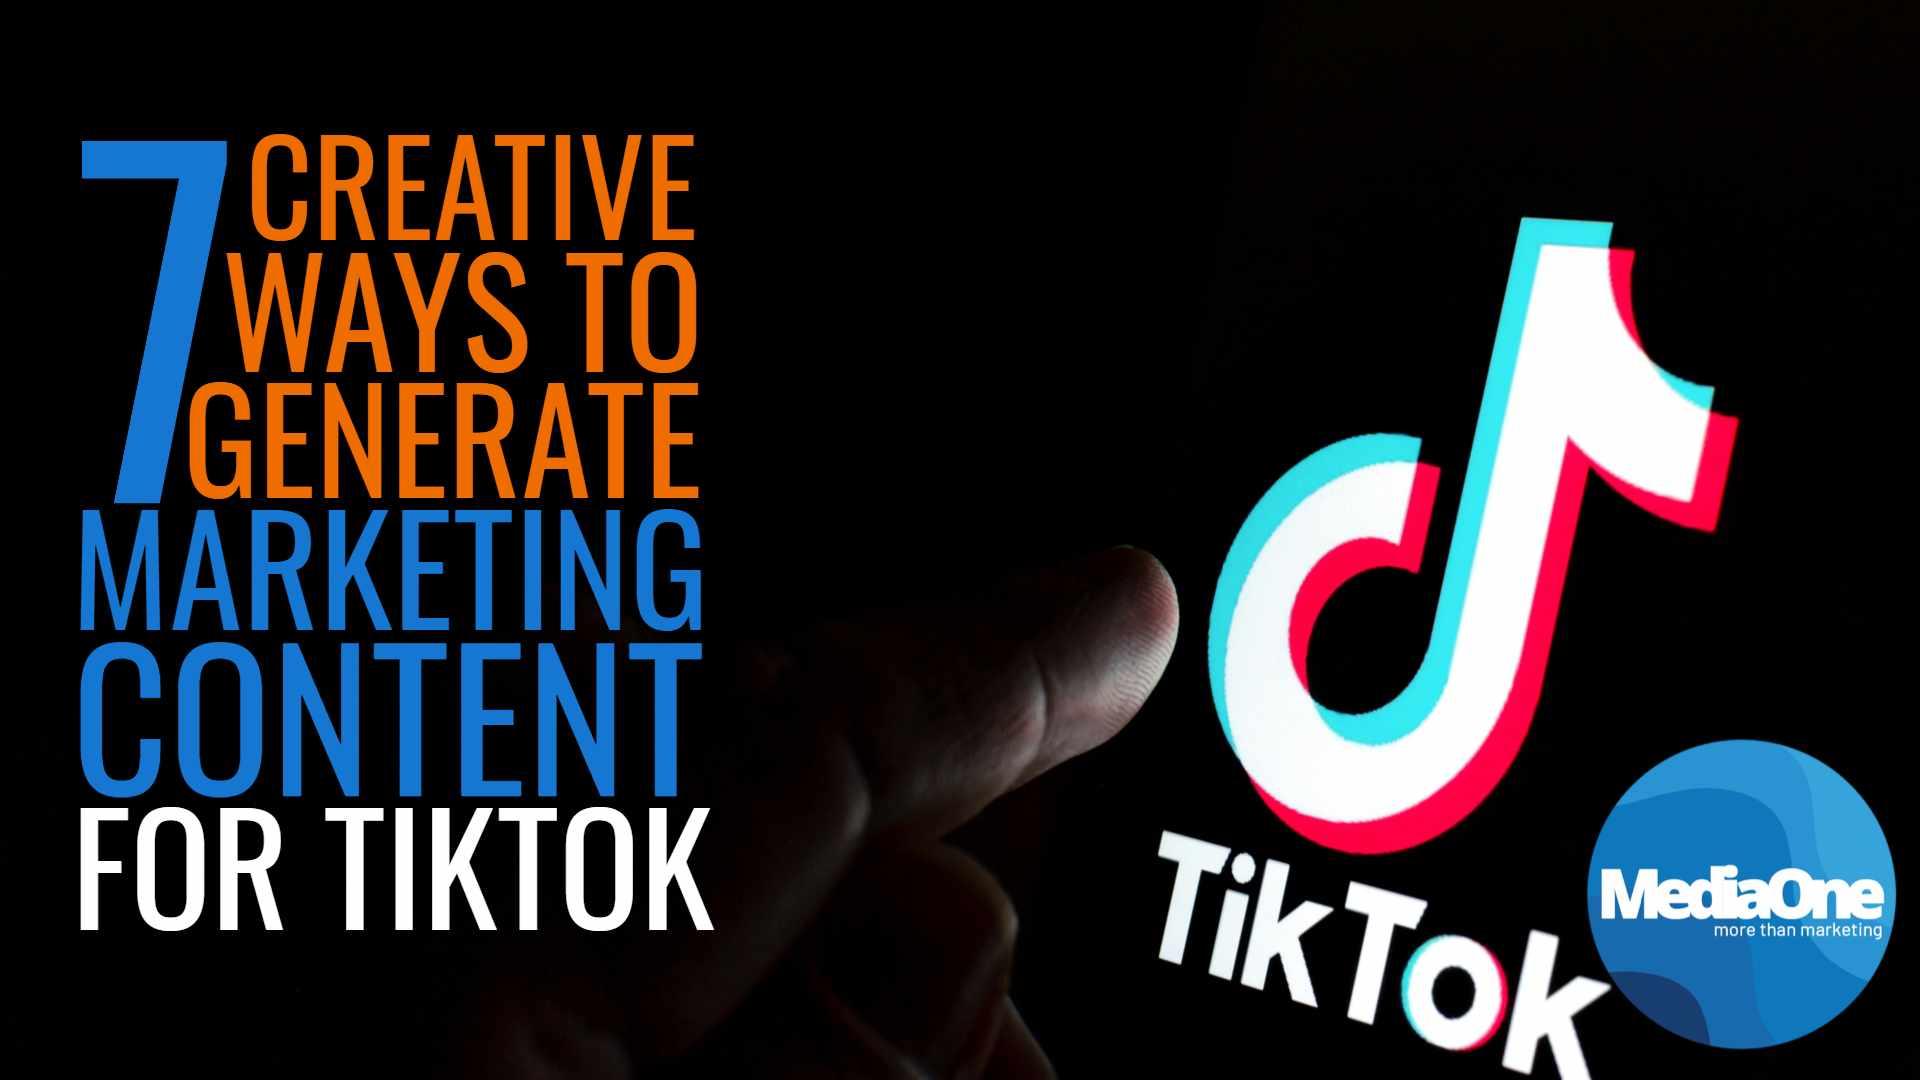 7-creative-ways-to-generate-interesting-marketing-content-for-tiktok-2